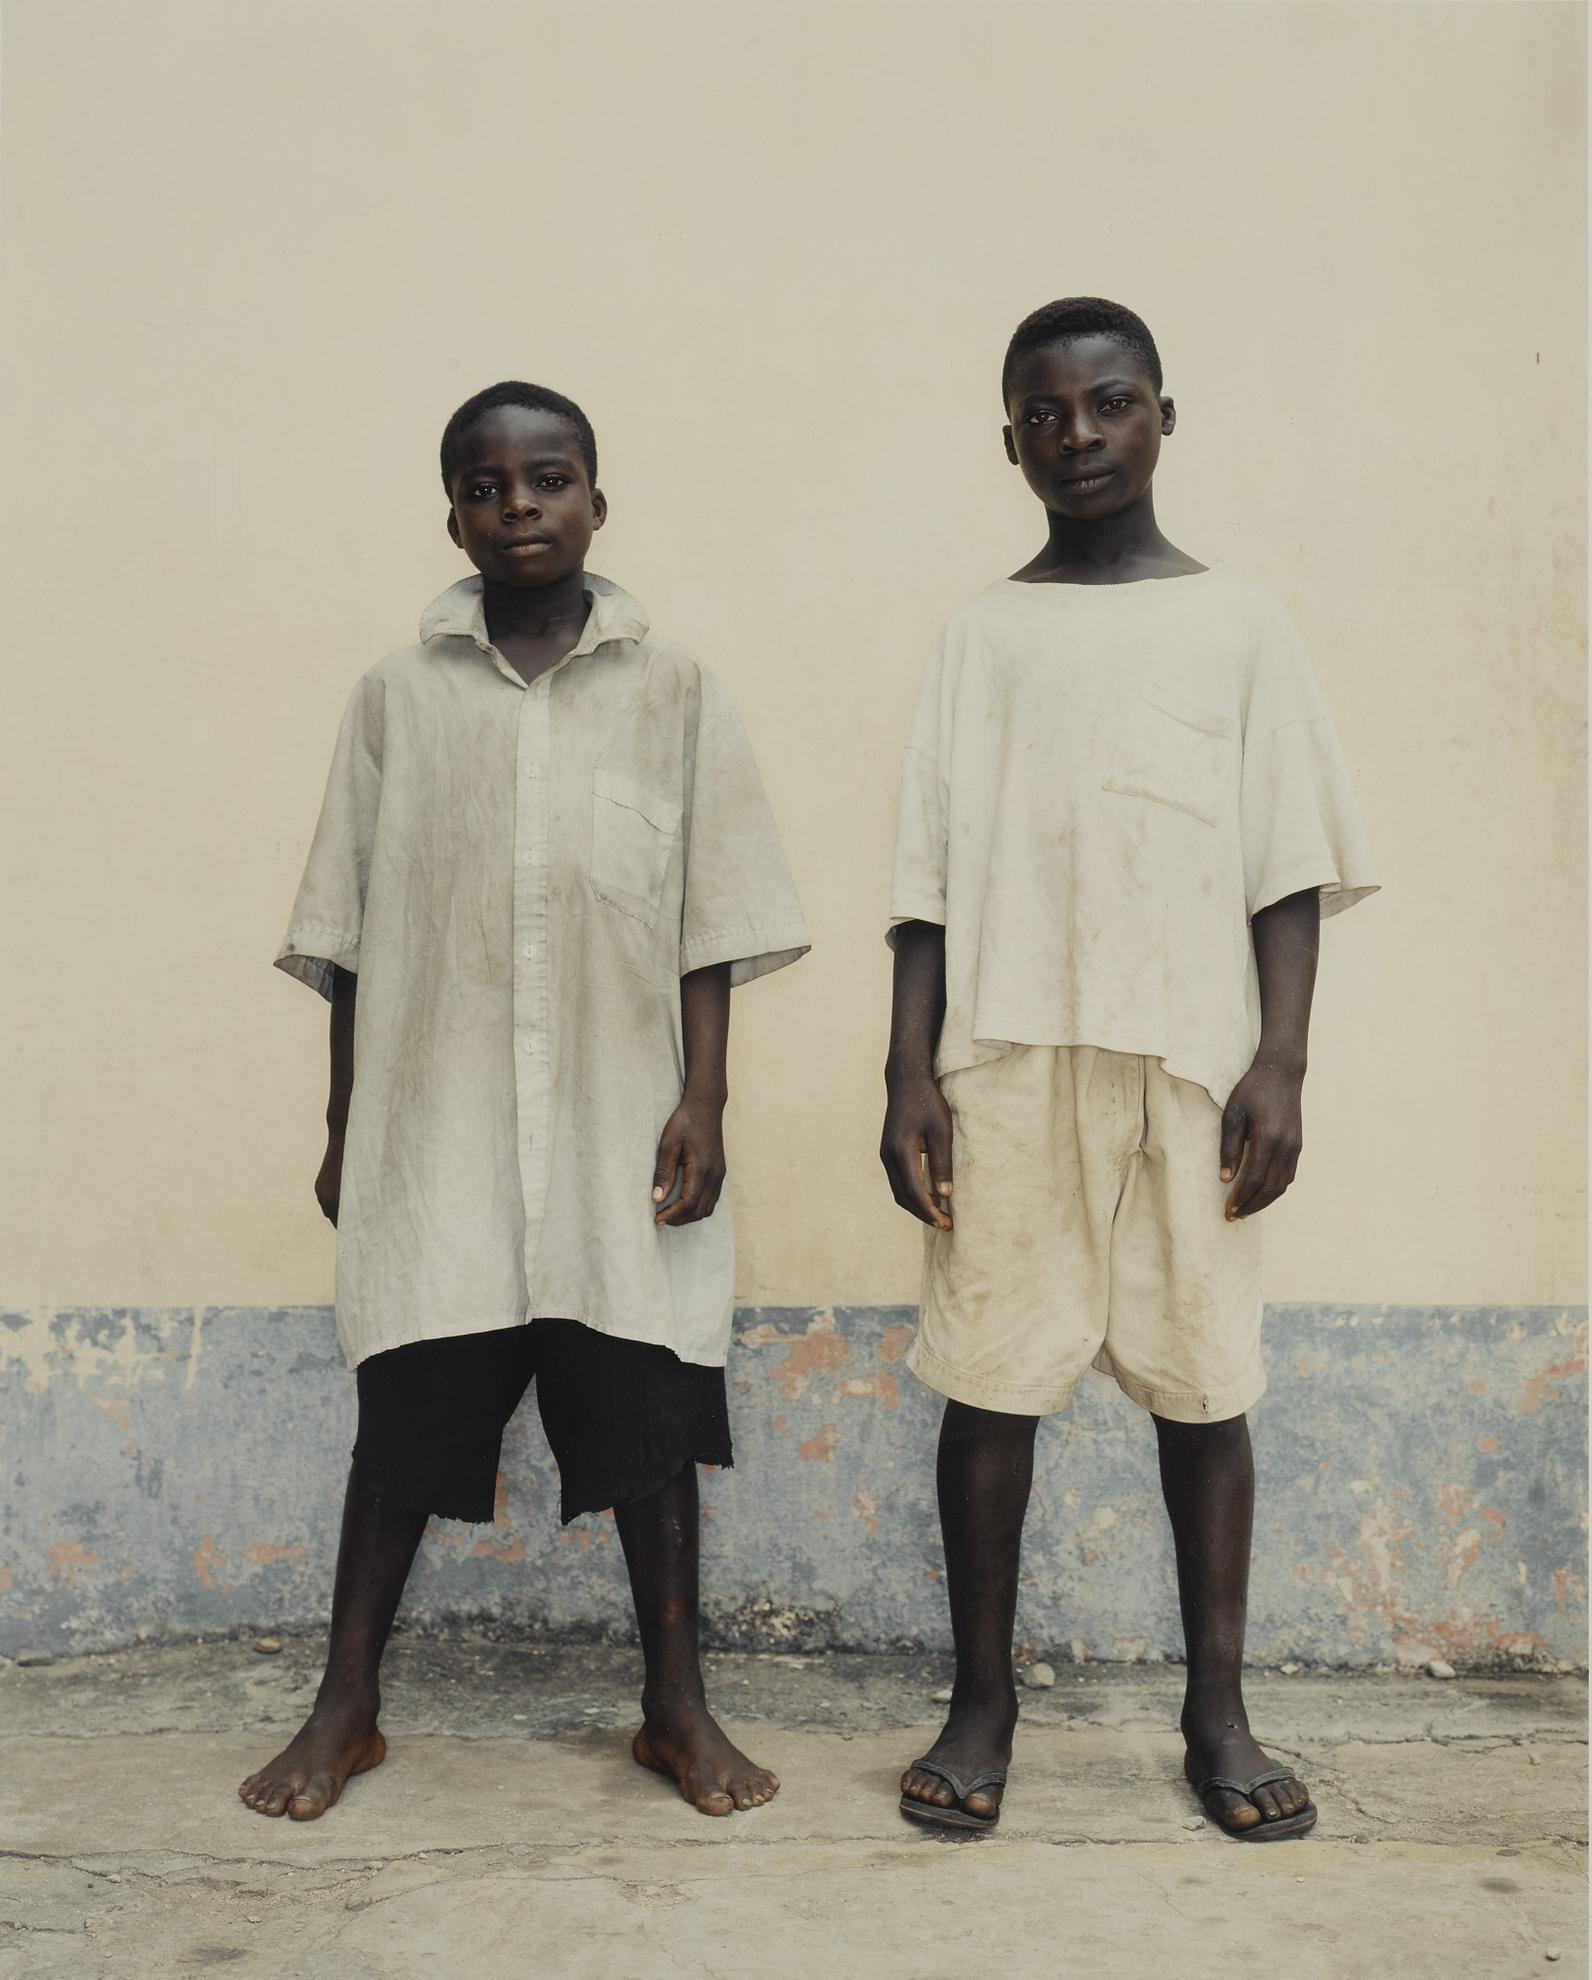 Rineke Dijkstra-Accra, Ghana, Africa, March 1, 1996-1996